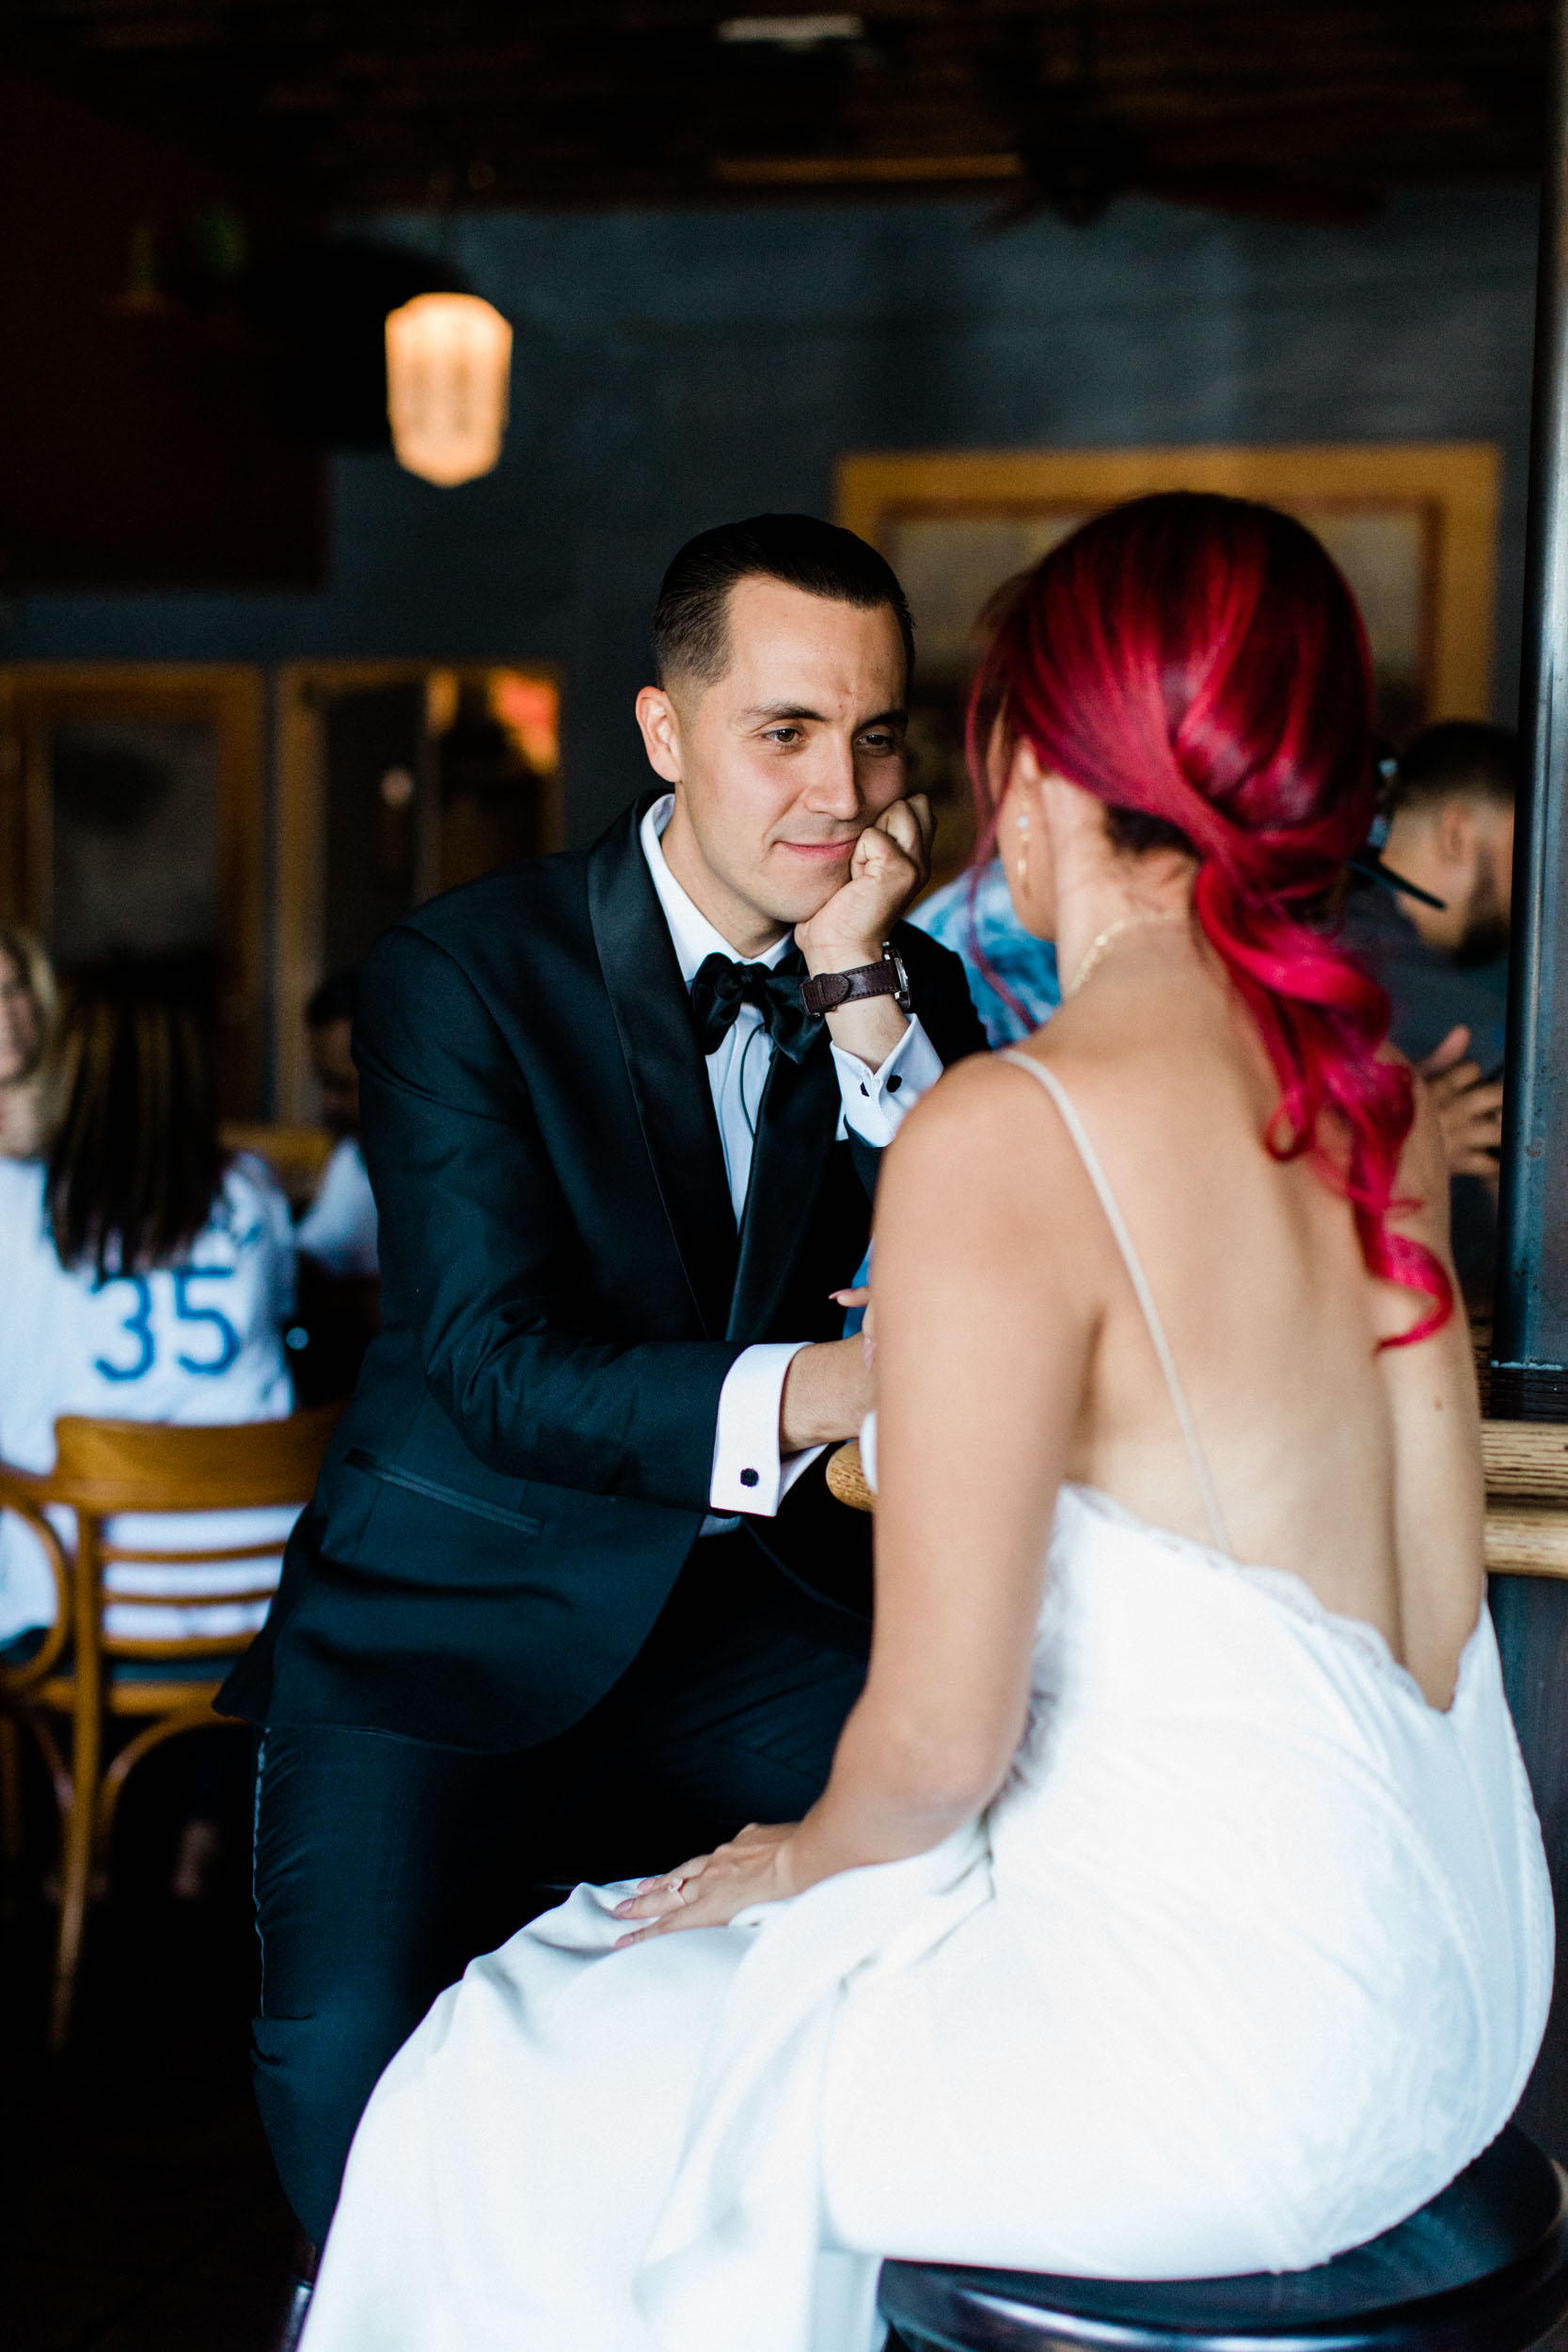 BKM-Photography-Los-Angeles-Highland-Park-York-Manor-Wedding-Photography-0233.jpg